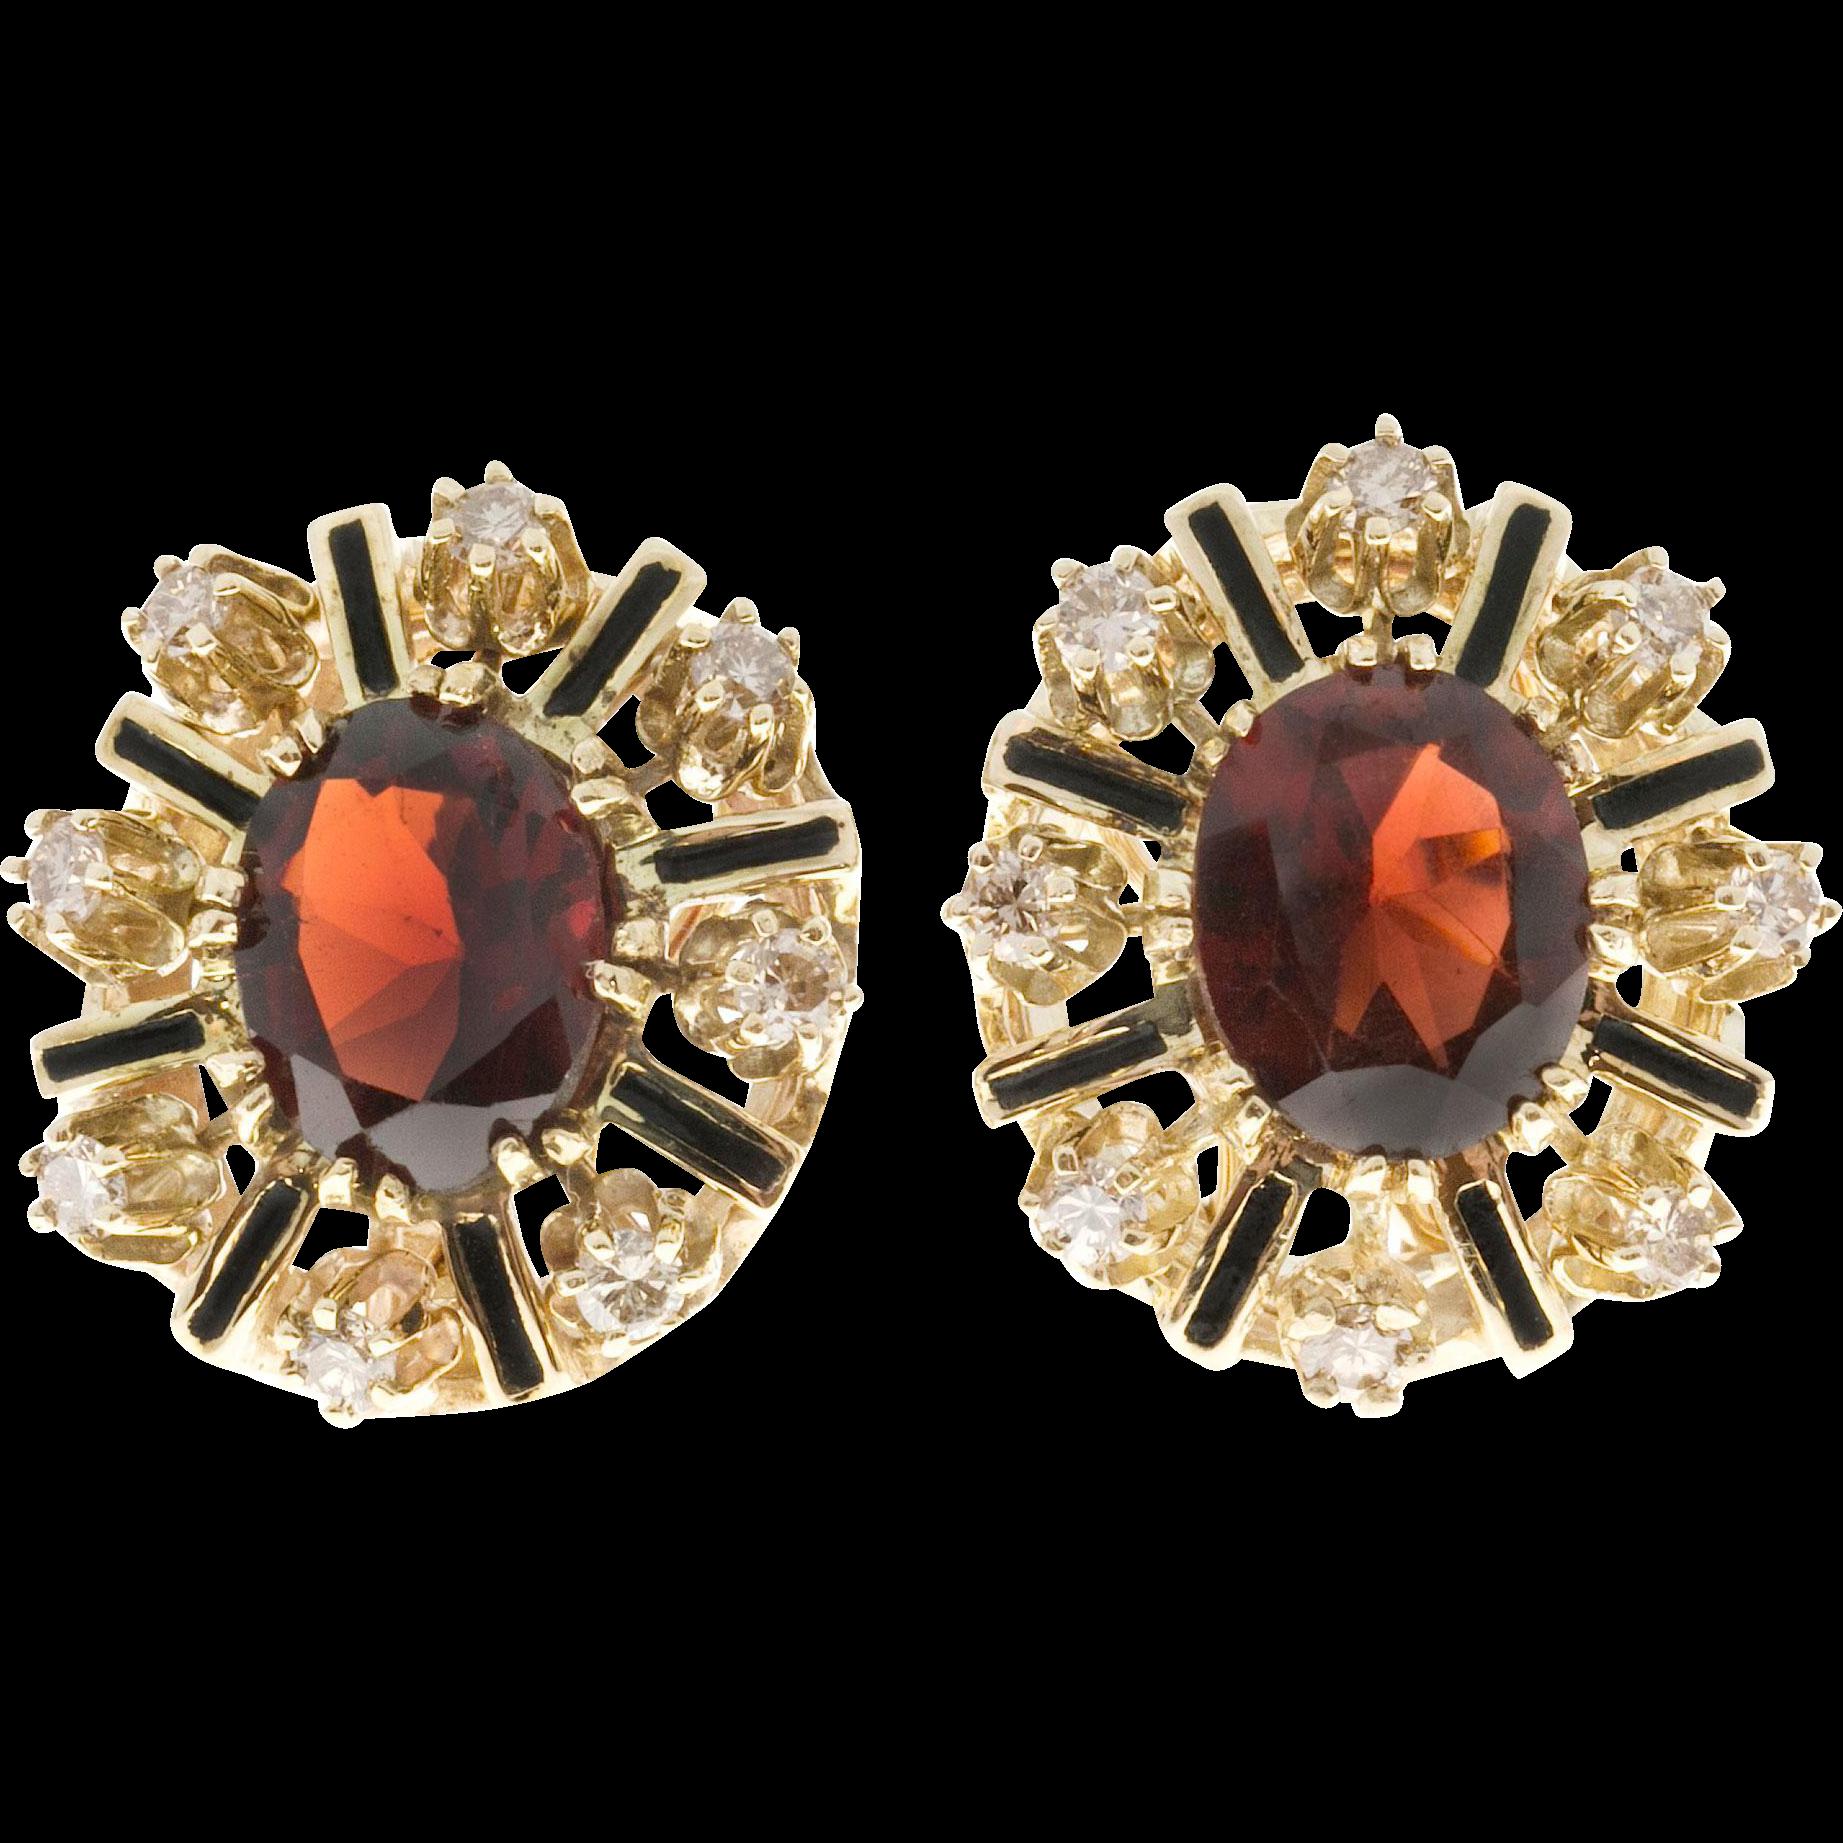 Reddish Brown Garnet Diamond Enamel 14 Karat Gold Earrings